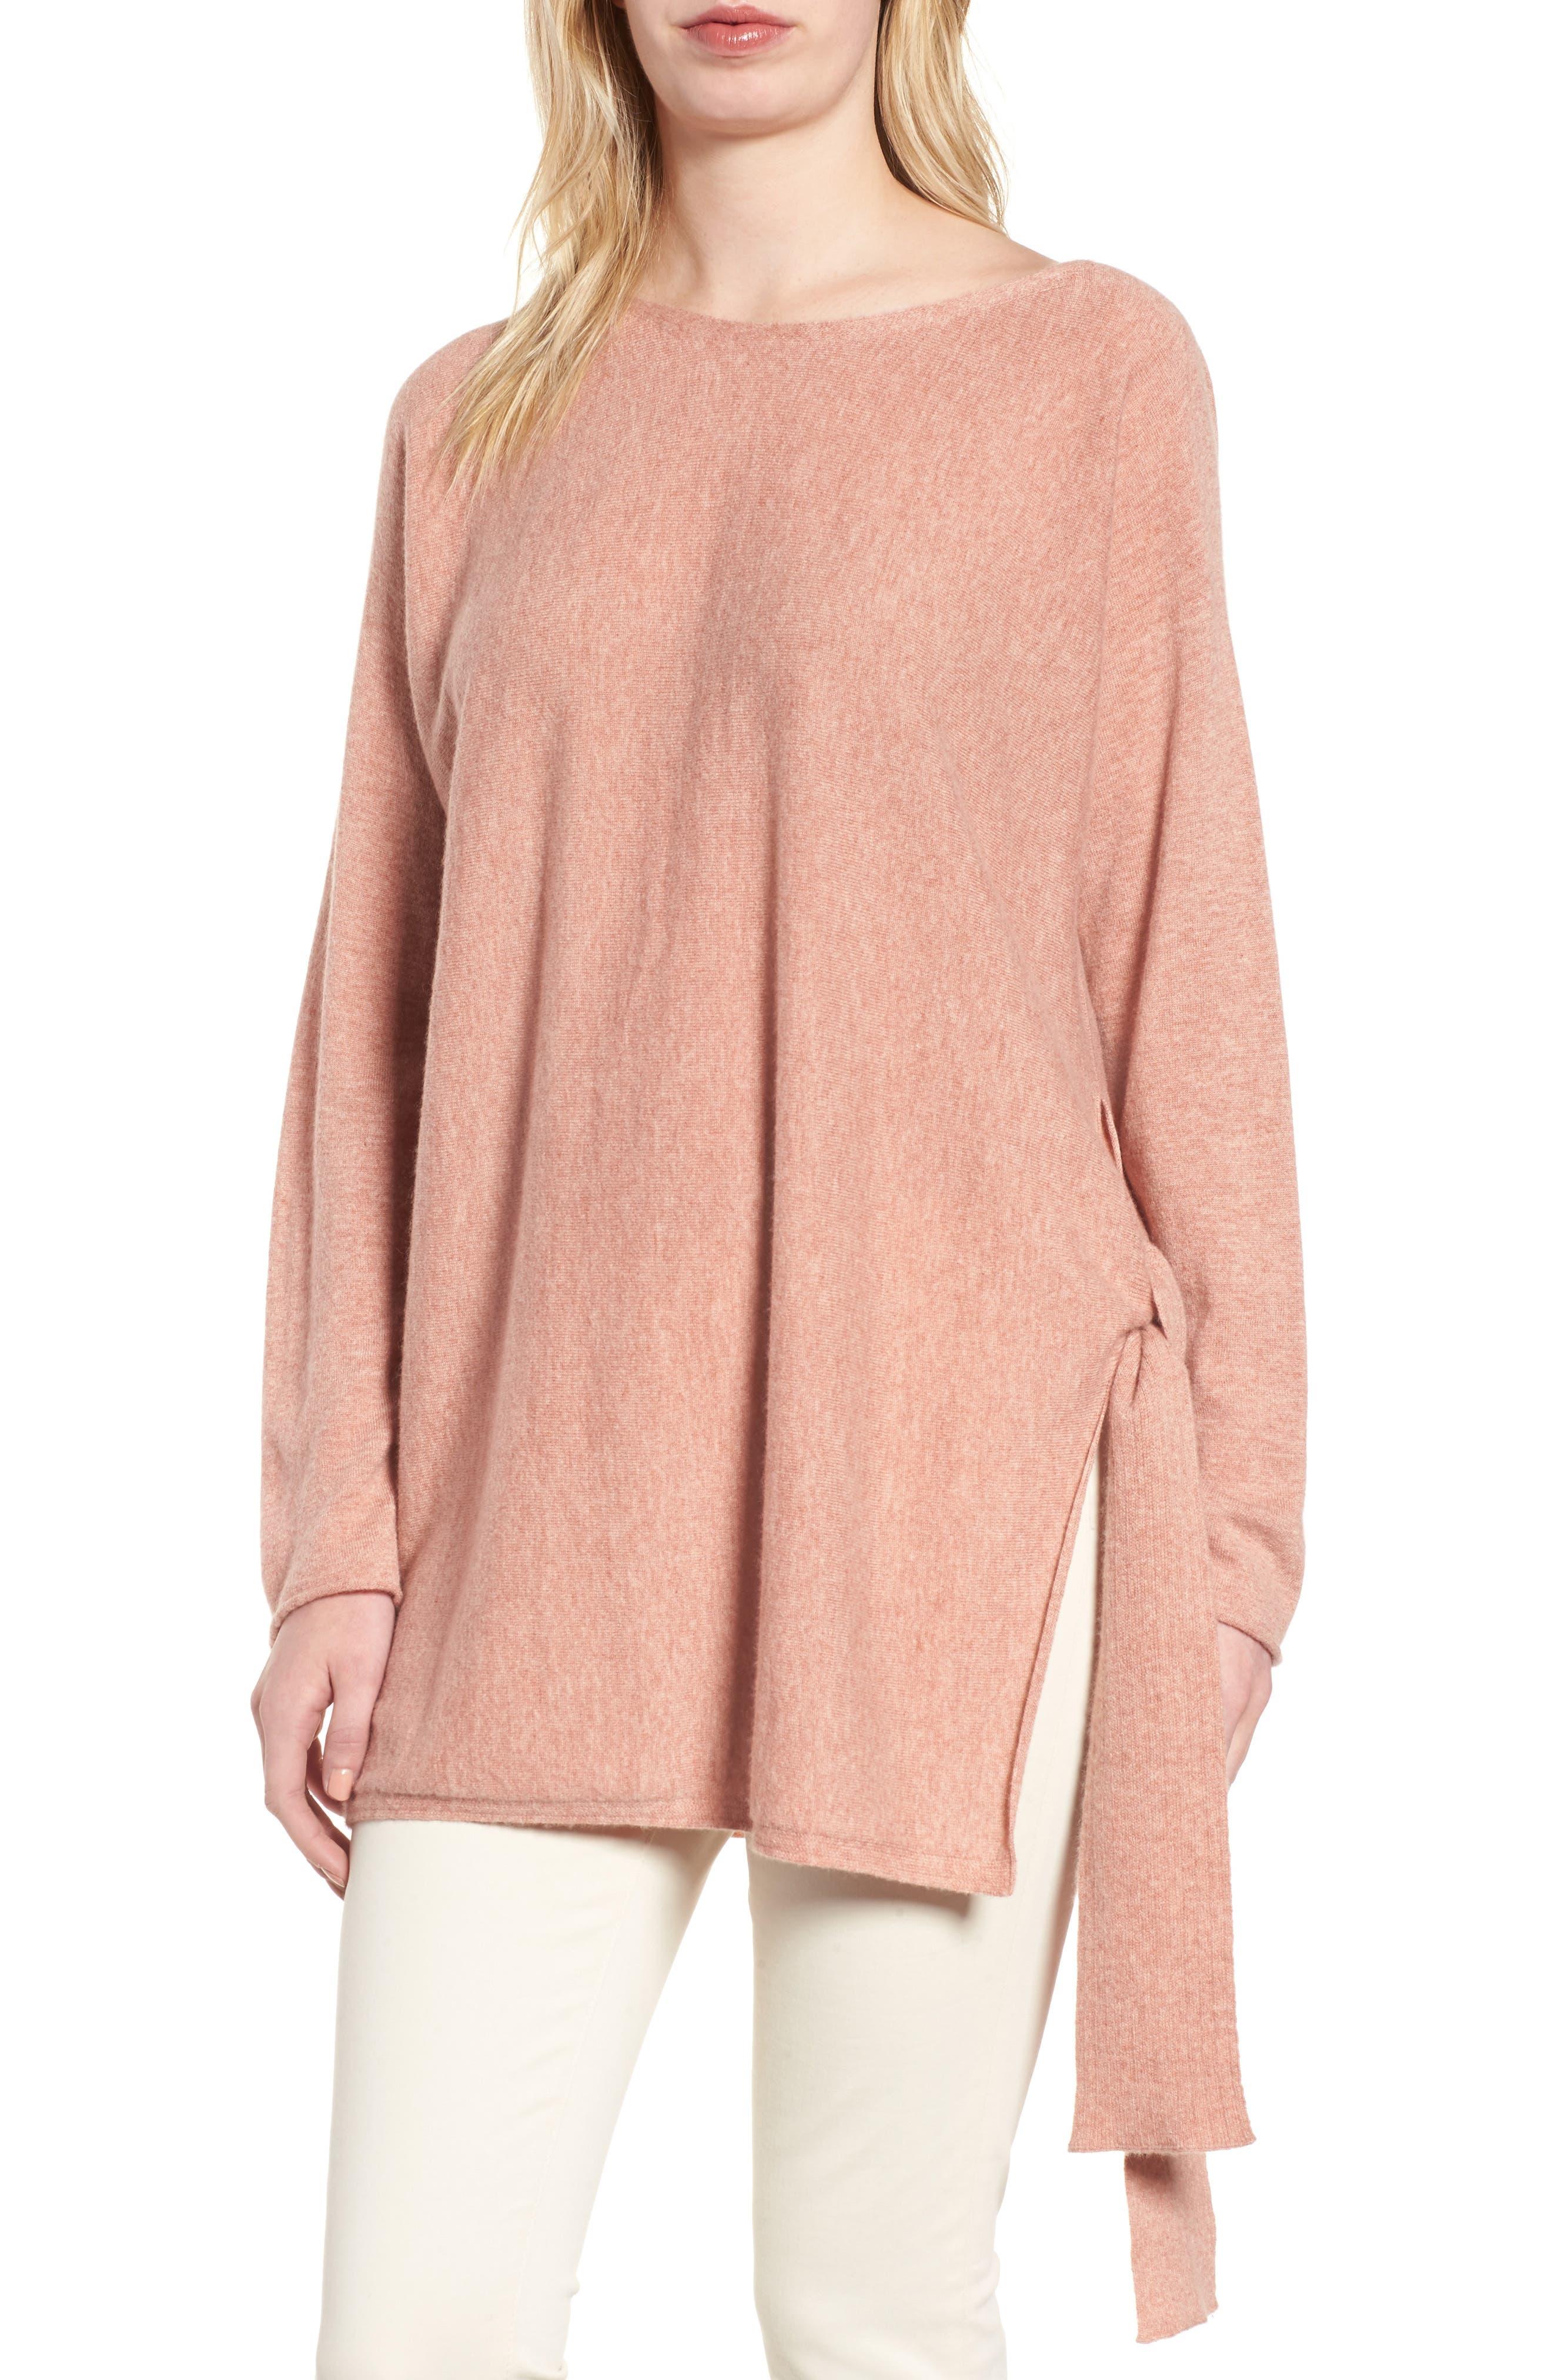 Main Image - Eileen Fisher Cashmere Tunic Sweater